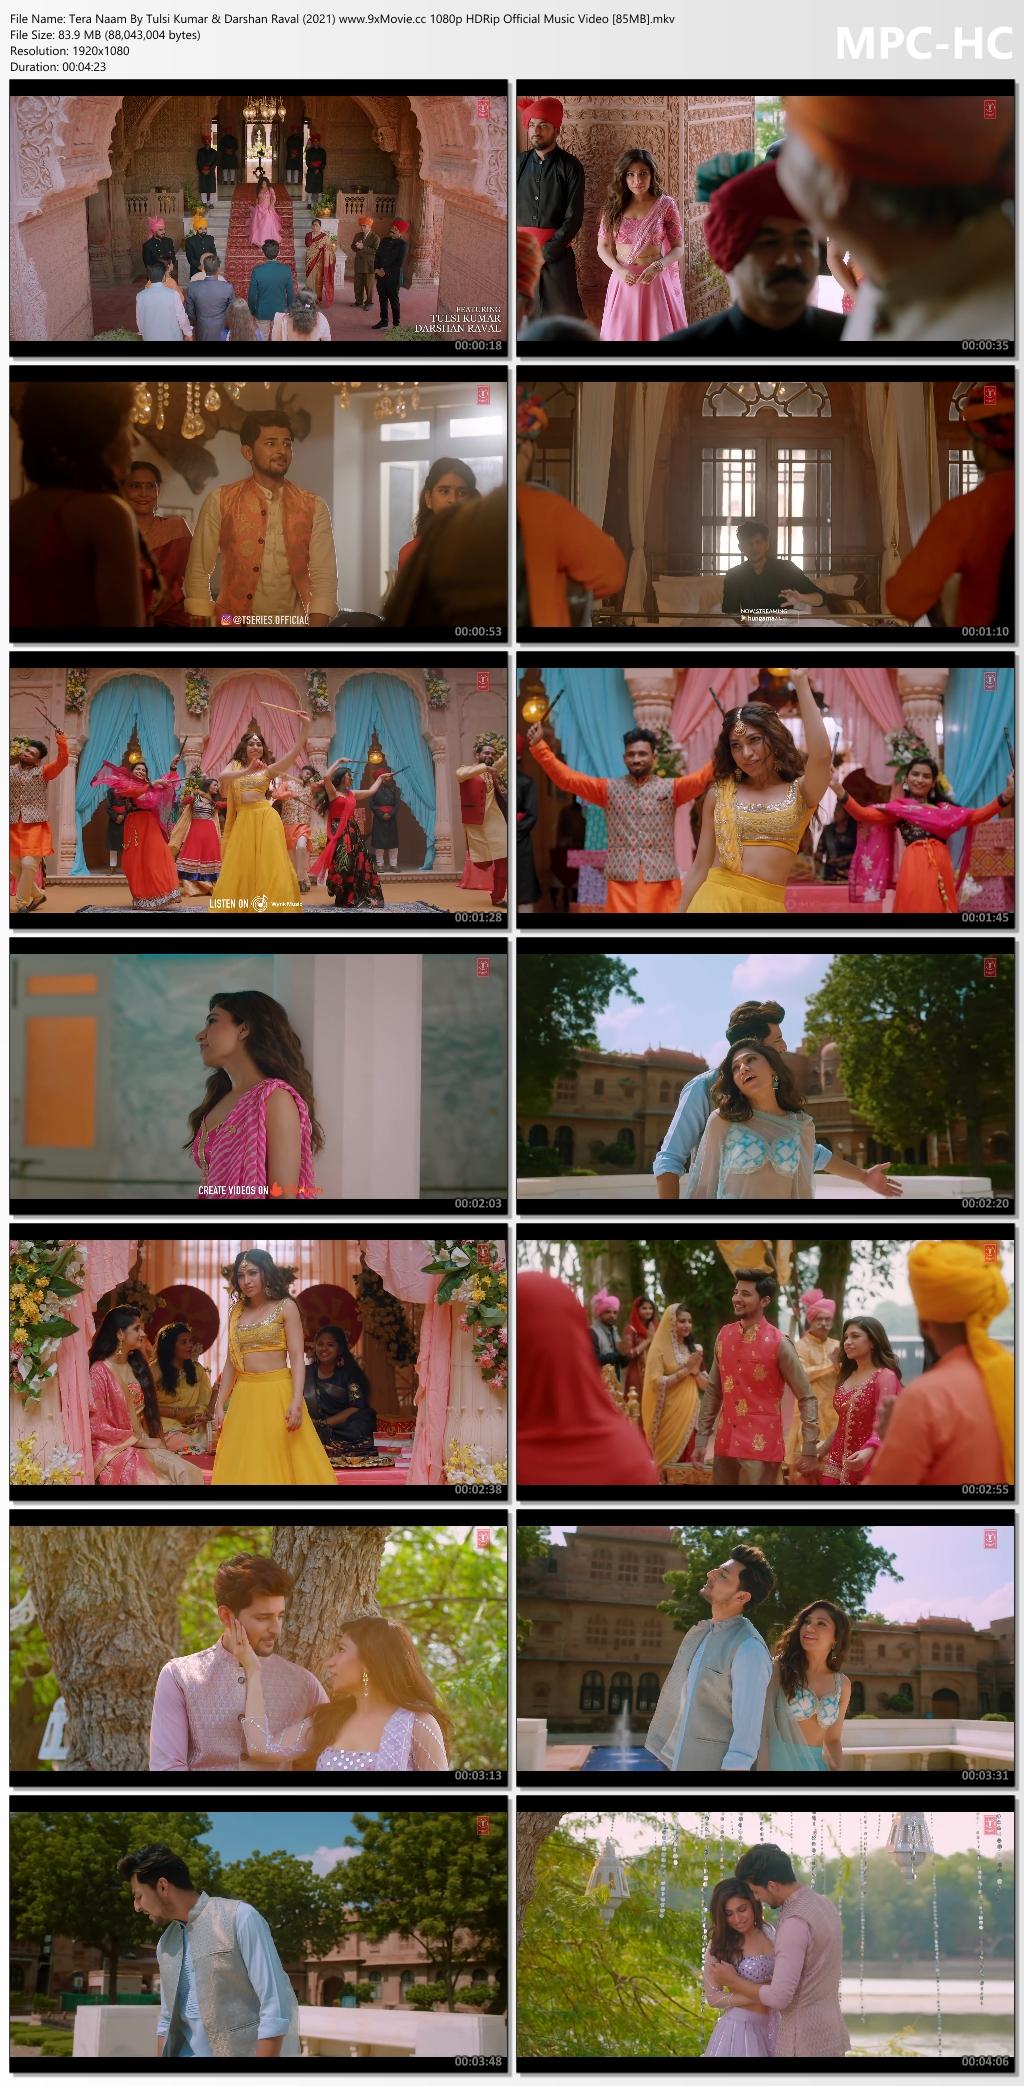 Tera-Naam-By-Tulsi-Kumar-Darshan-Raval-2021-www-9x-Movie-cc-1080p-HDRip-Official-Music-Video-85-MB-m